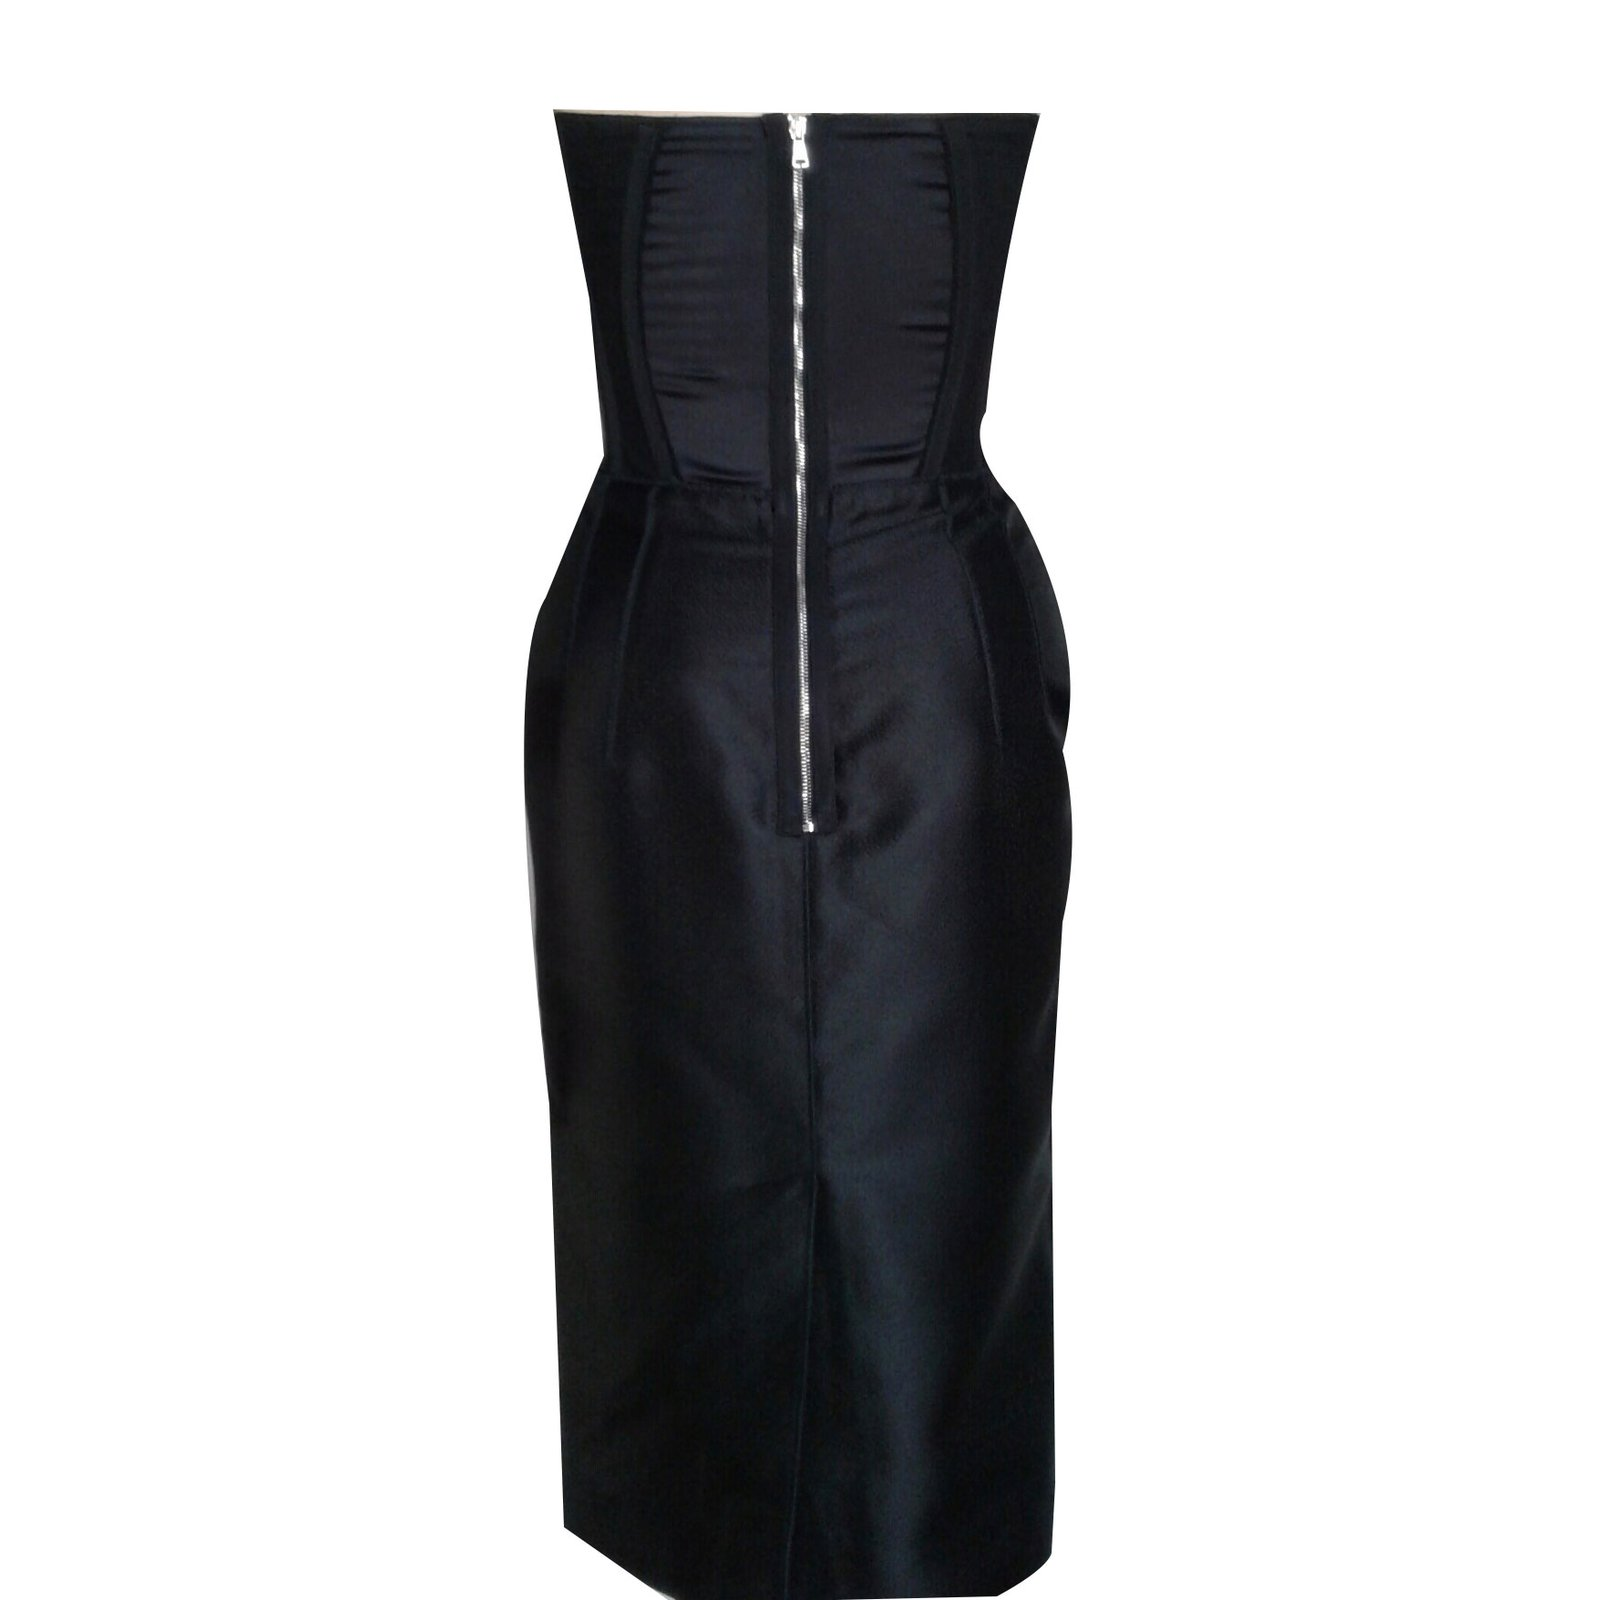 9e320a53772 Dolce   Gabbana Dresses Dresses Polyester Black ref.47649 - Joli Closet